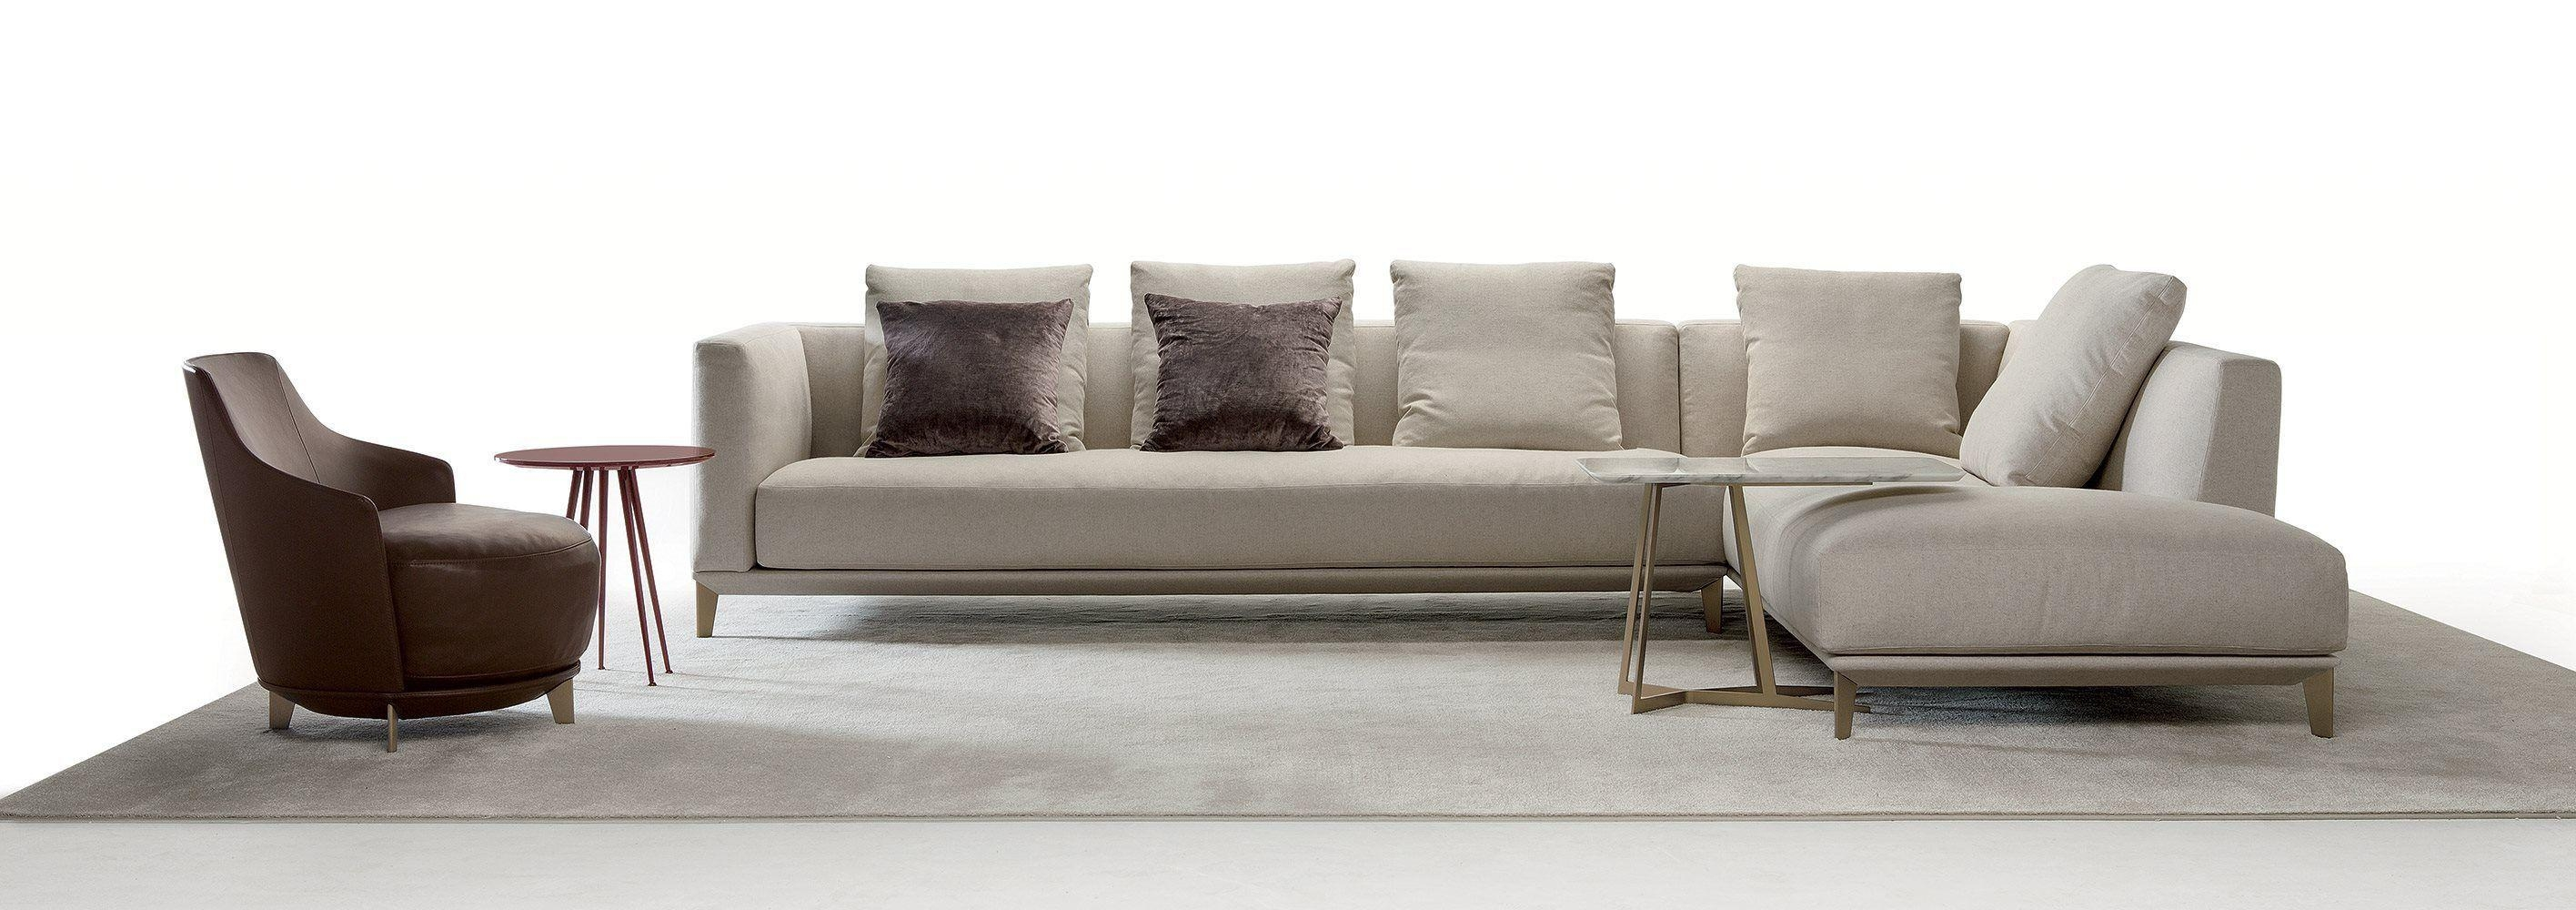 Corner Sofa / Modular / Contemporary / Fabric – Dylancastello Throughout Contemporary Fabric Sofas (Image 8 of 20)